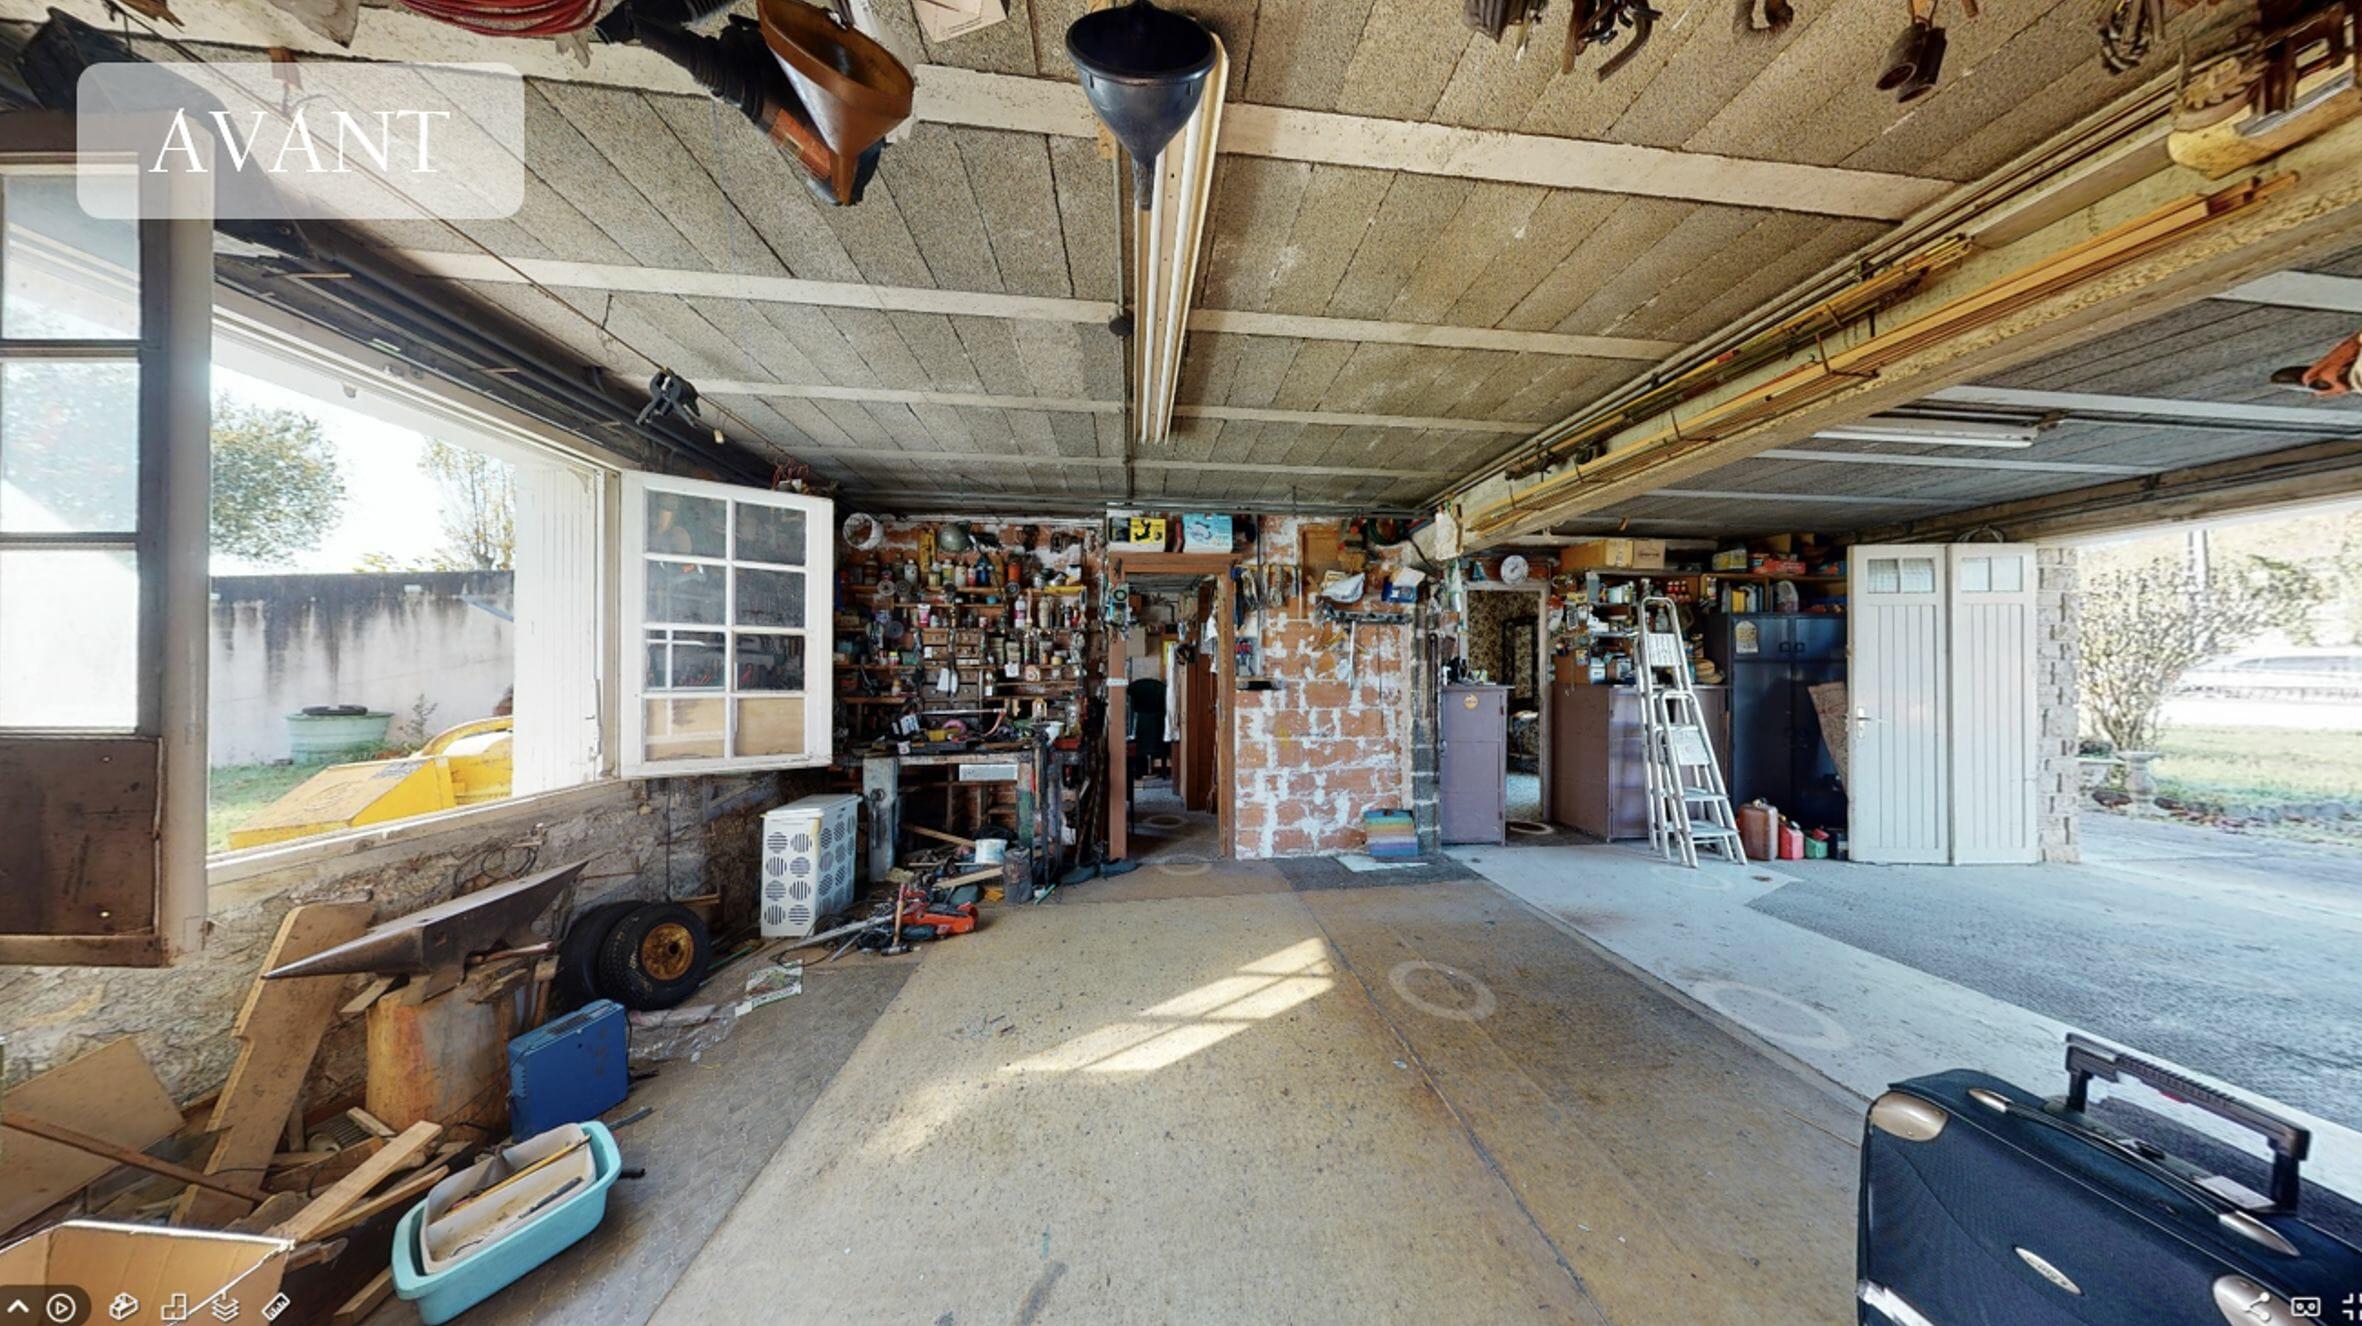 Avant-Urbanhouse360